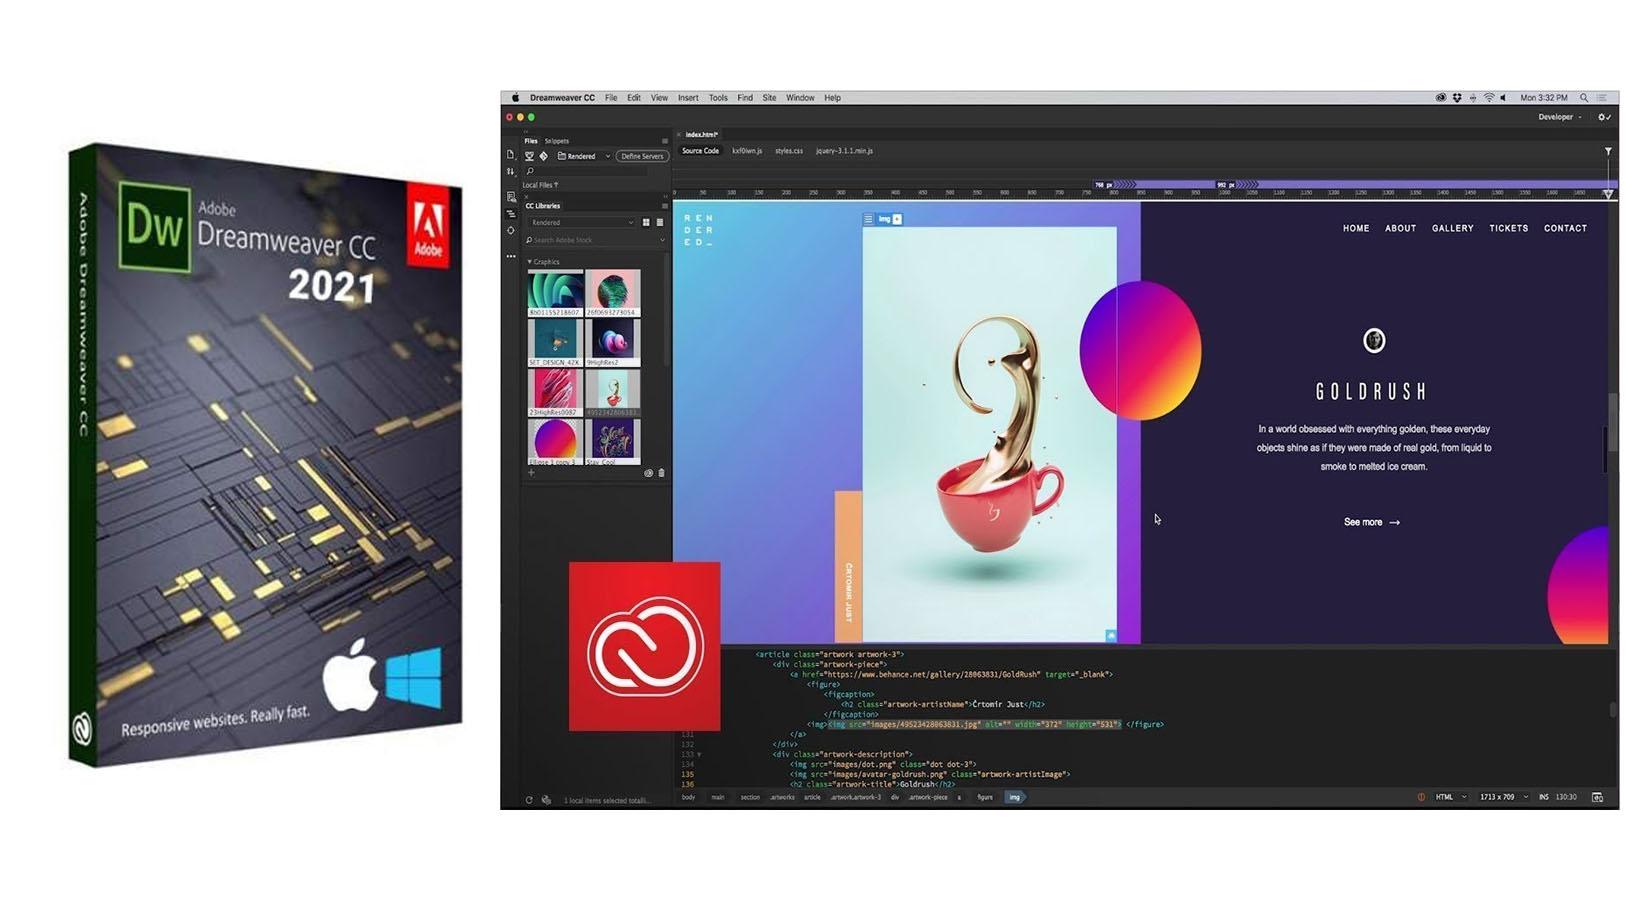 Cara Install Adobe Dreamweaver CC2021 Full Version